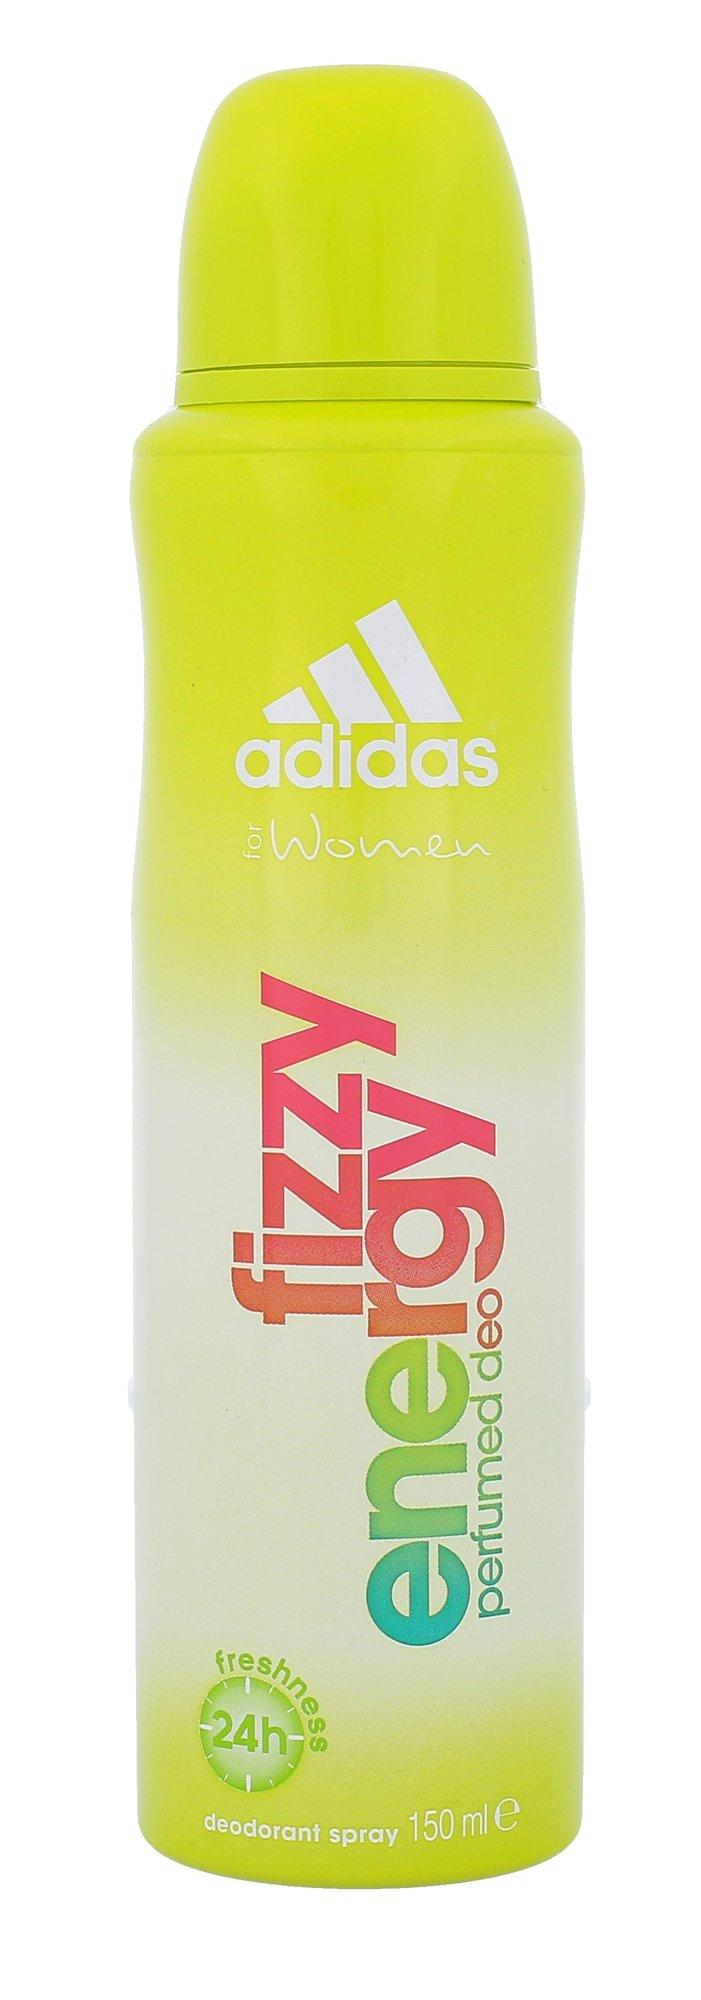 Adidas Fizzy Energy For Women Deodorant 150ml